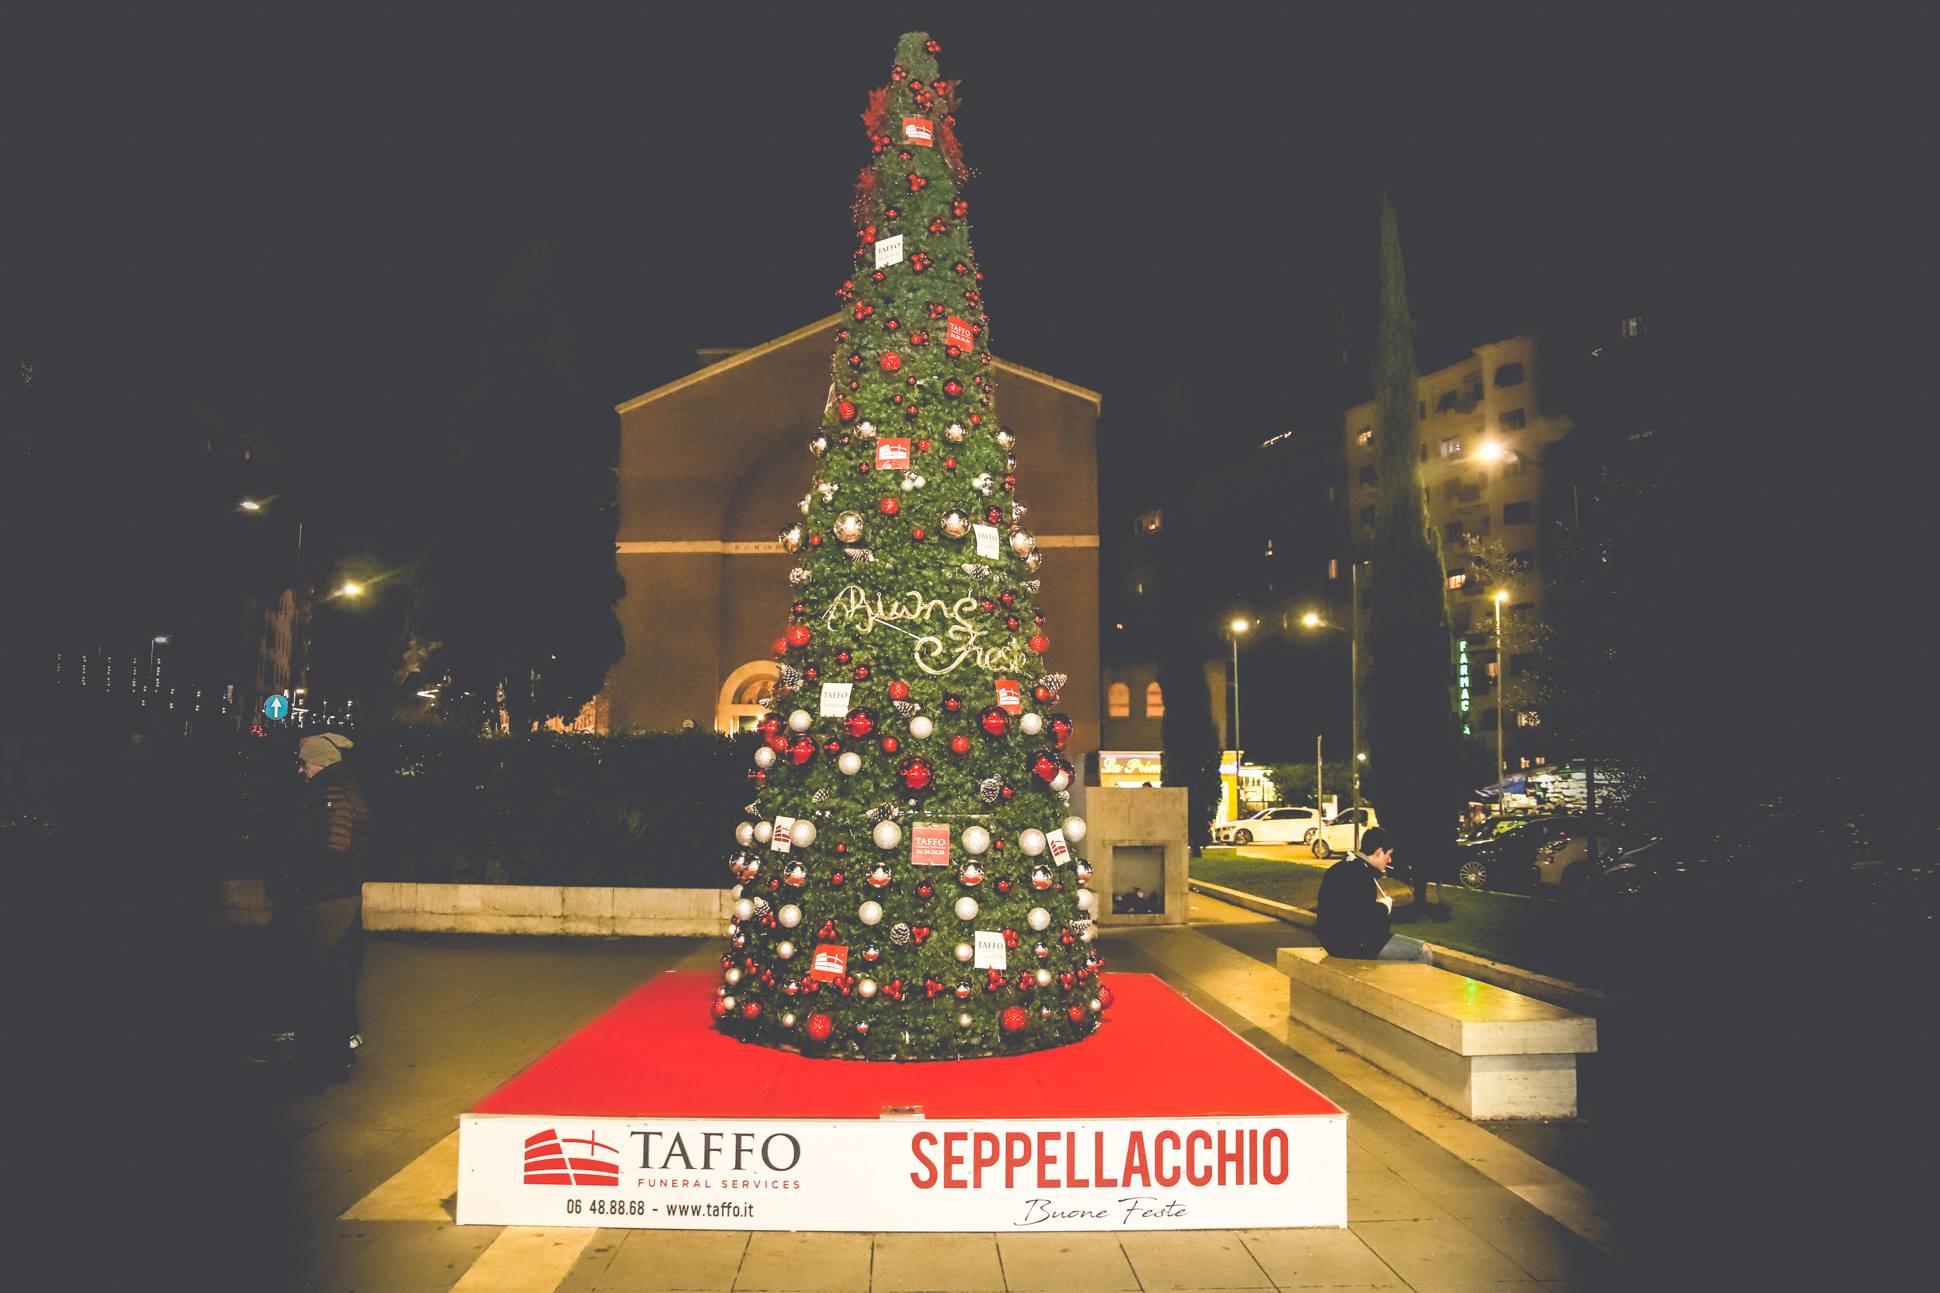 seppellacchio-taffo-wwf